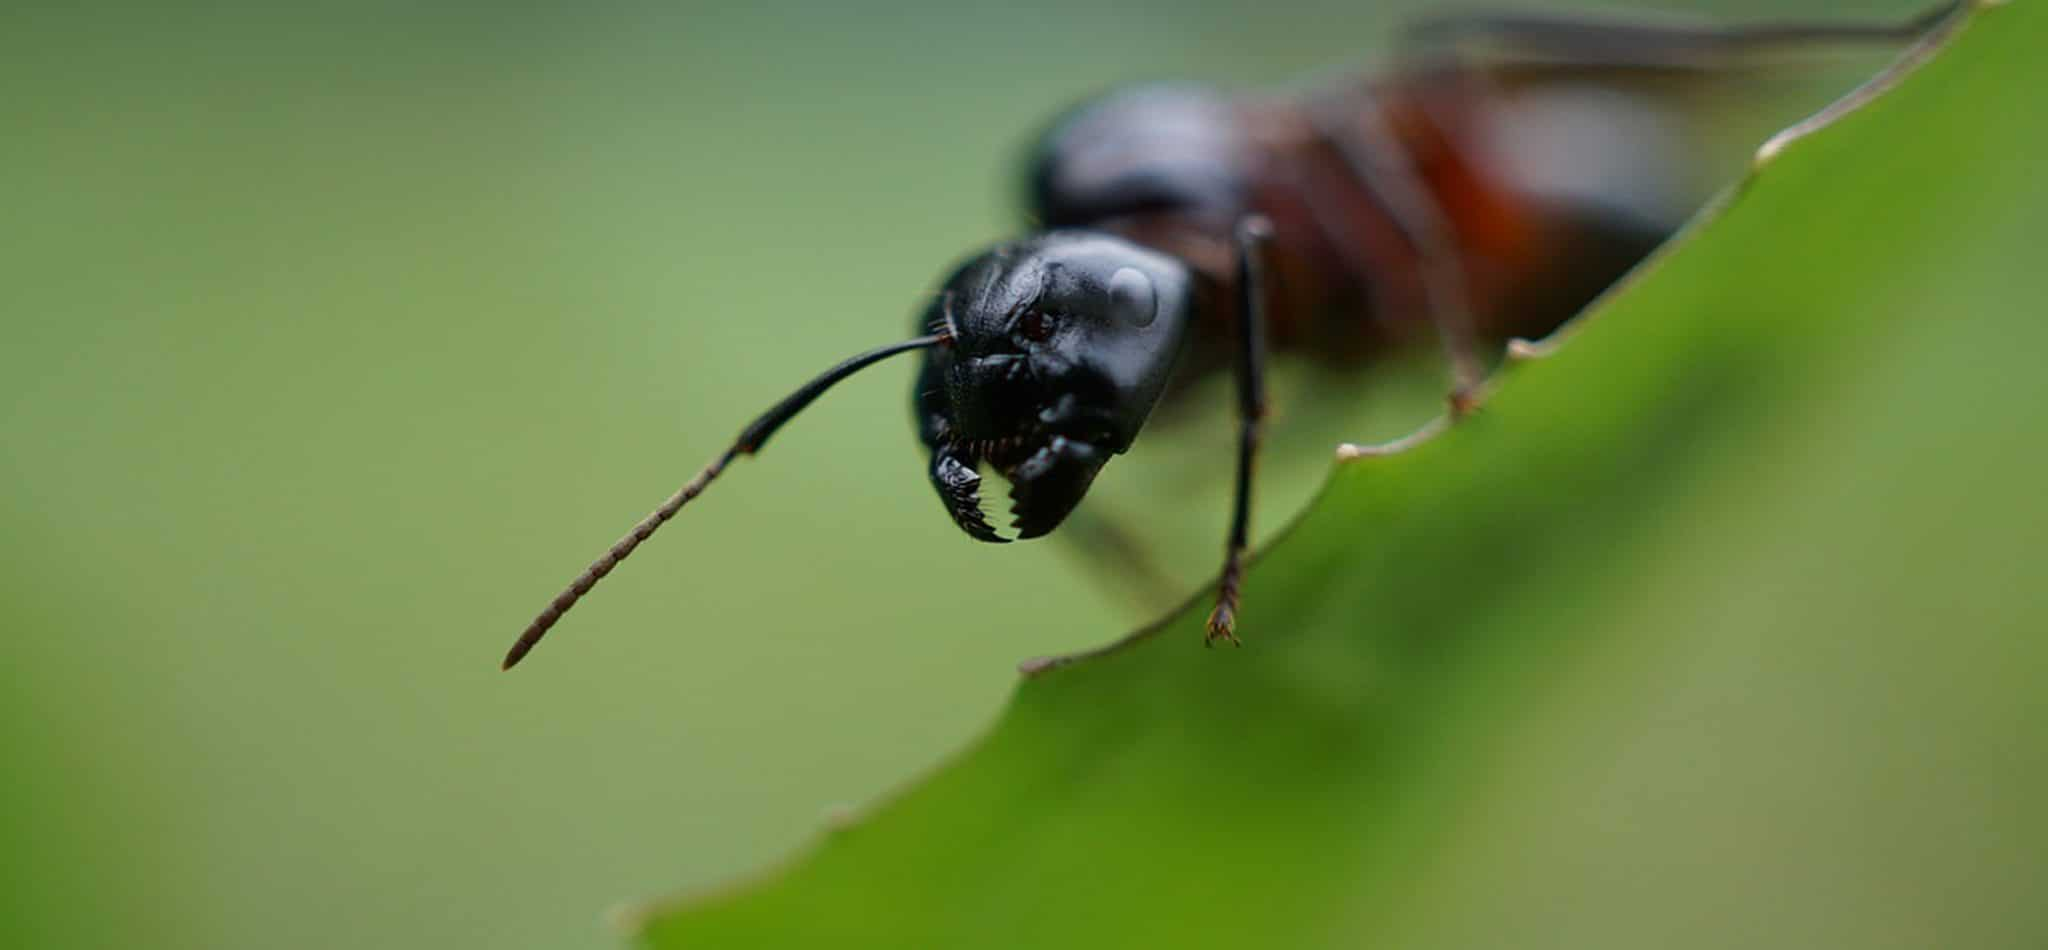 Pest Control Plandome, carpenter ants, carpenter ant, wasps, Rest Easy pest Control, Pest control services, Long Island NY, NYC, Rockland, Westchester, New York, Long Island, Pest Control, Exterminator, Brooklyn, Bronx, Staten Island, NY, exterminator, Nassau County, Suffolk County, bugs, bed bugs, organic pest control, organic exterminator, organic pest, ants,